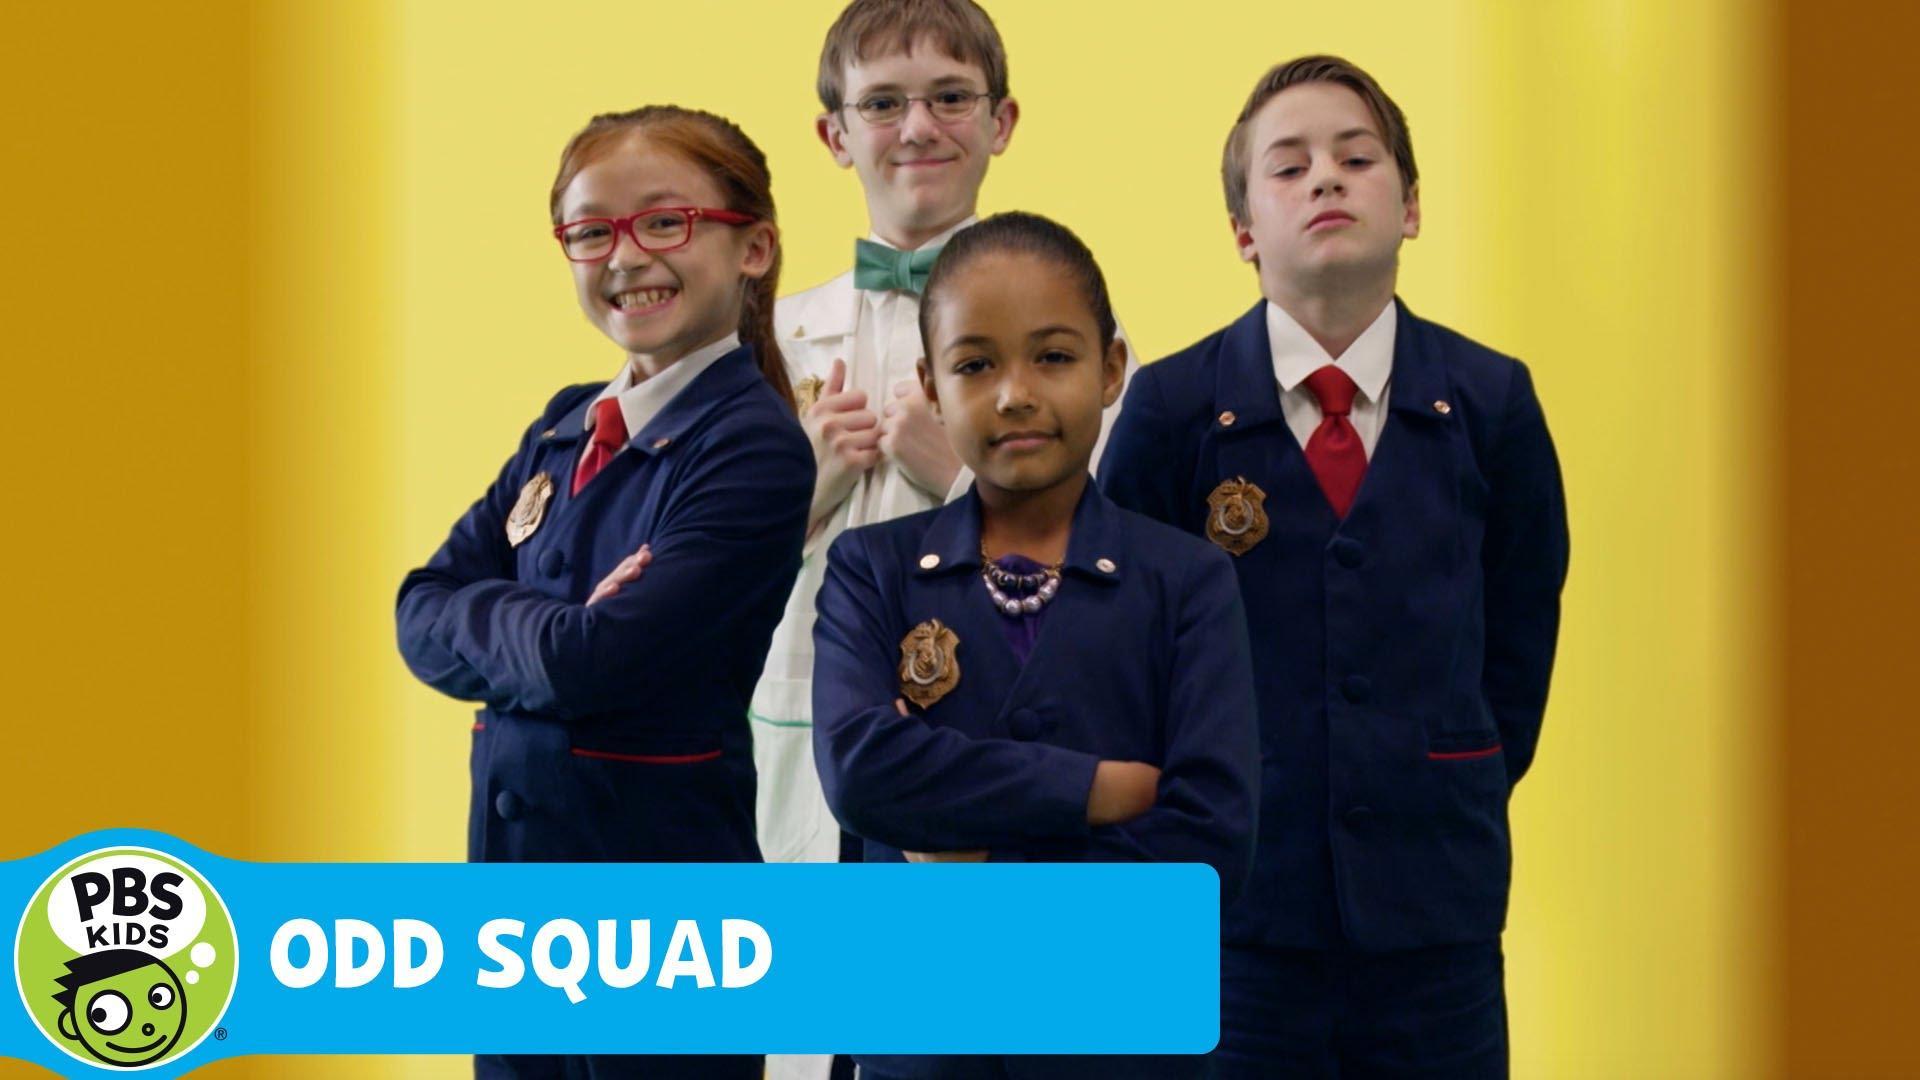 Odd Squad Zoom Background 6